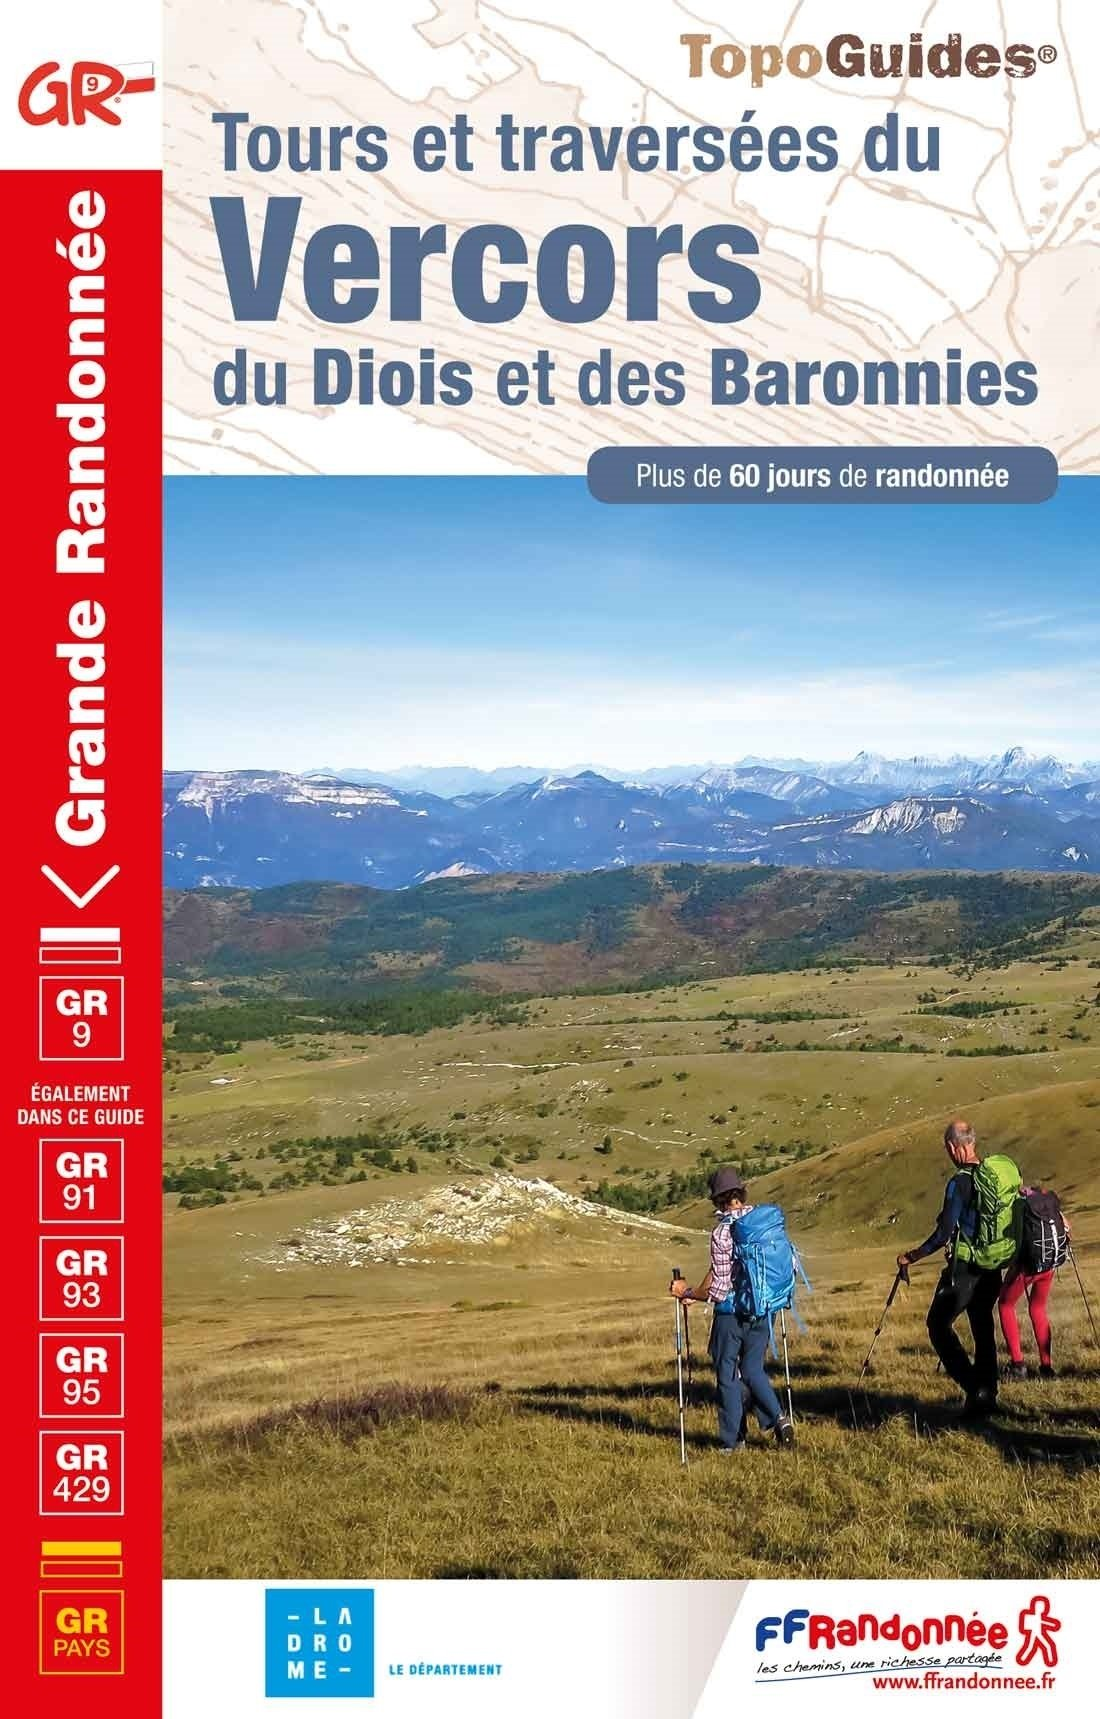 TG904  Vercors, Diois, Baronnies; GR9 9782751403910  FFRP Topoguides  Meerdaagse wandelroutes, Wandelgidsen Ardèche, Drôme, Franse Alpen: noord